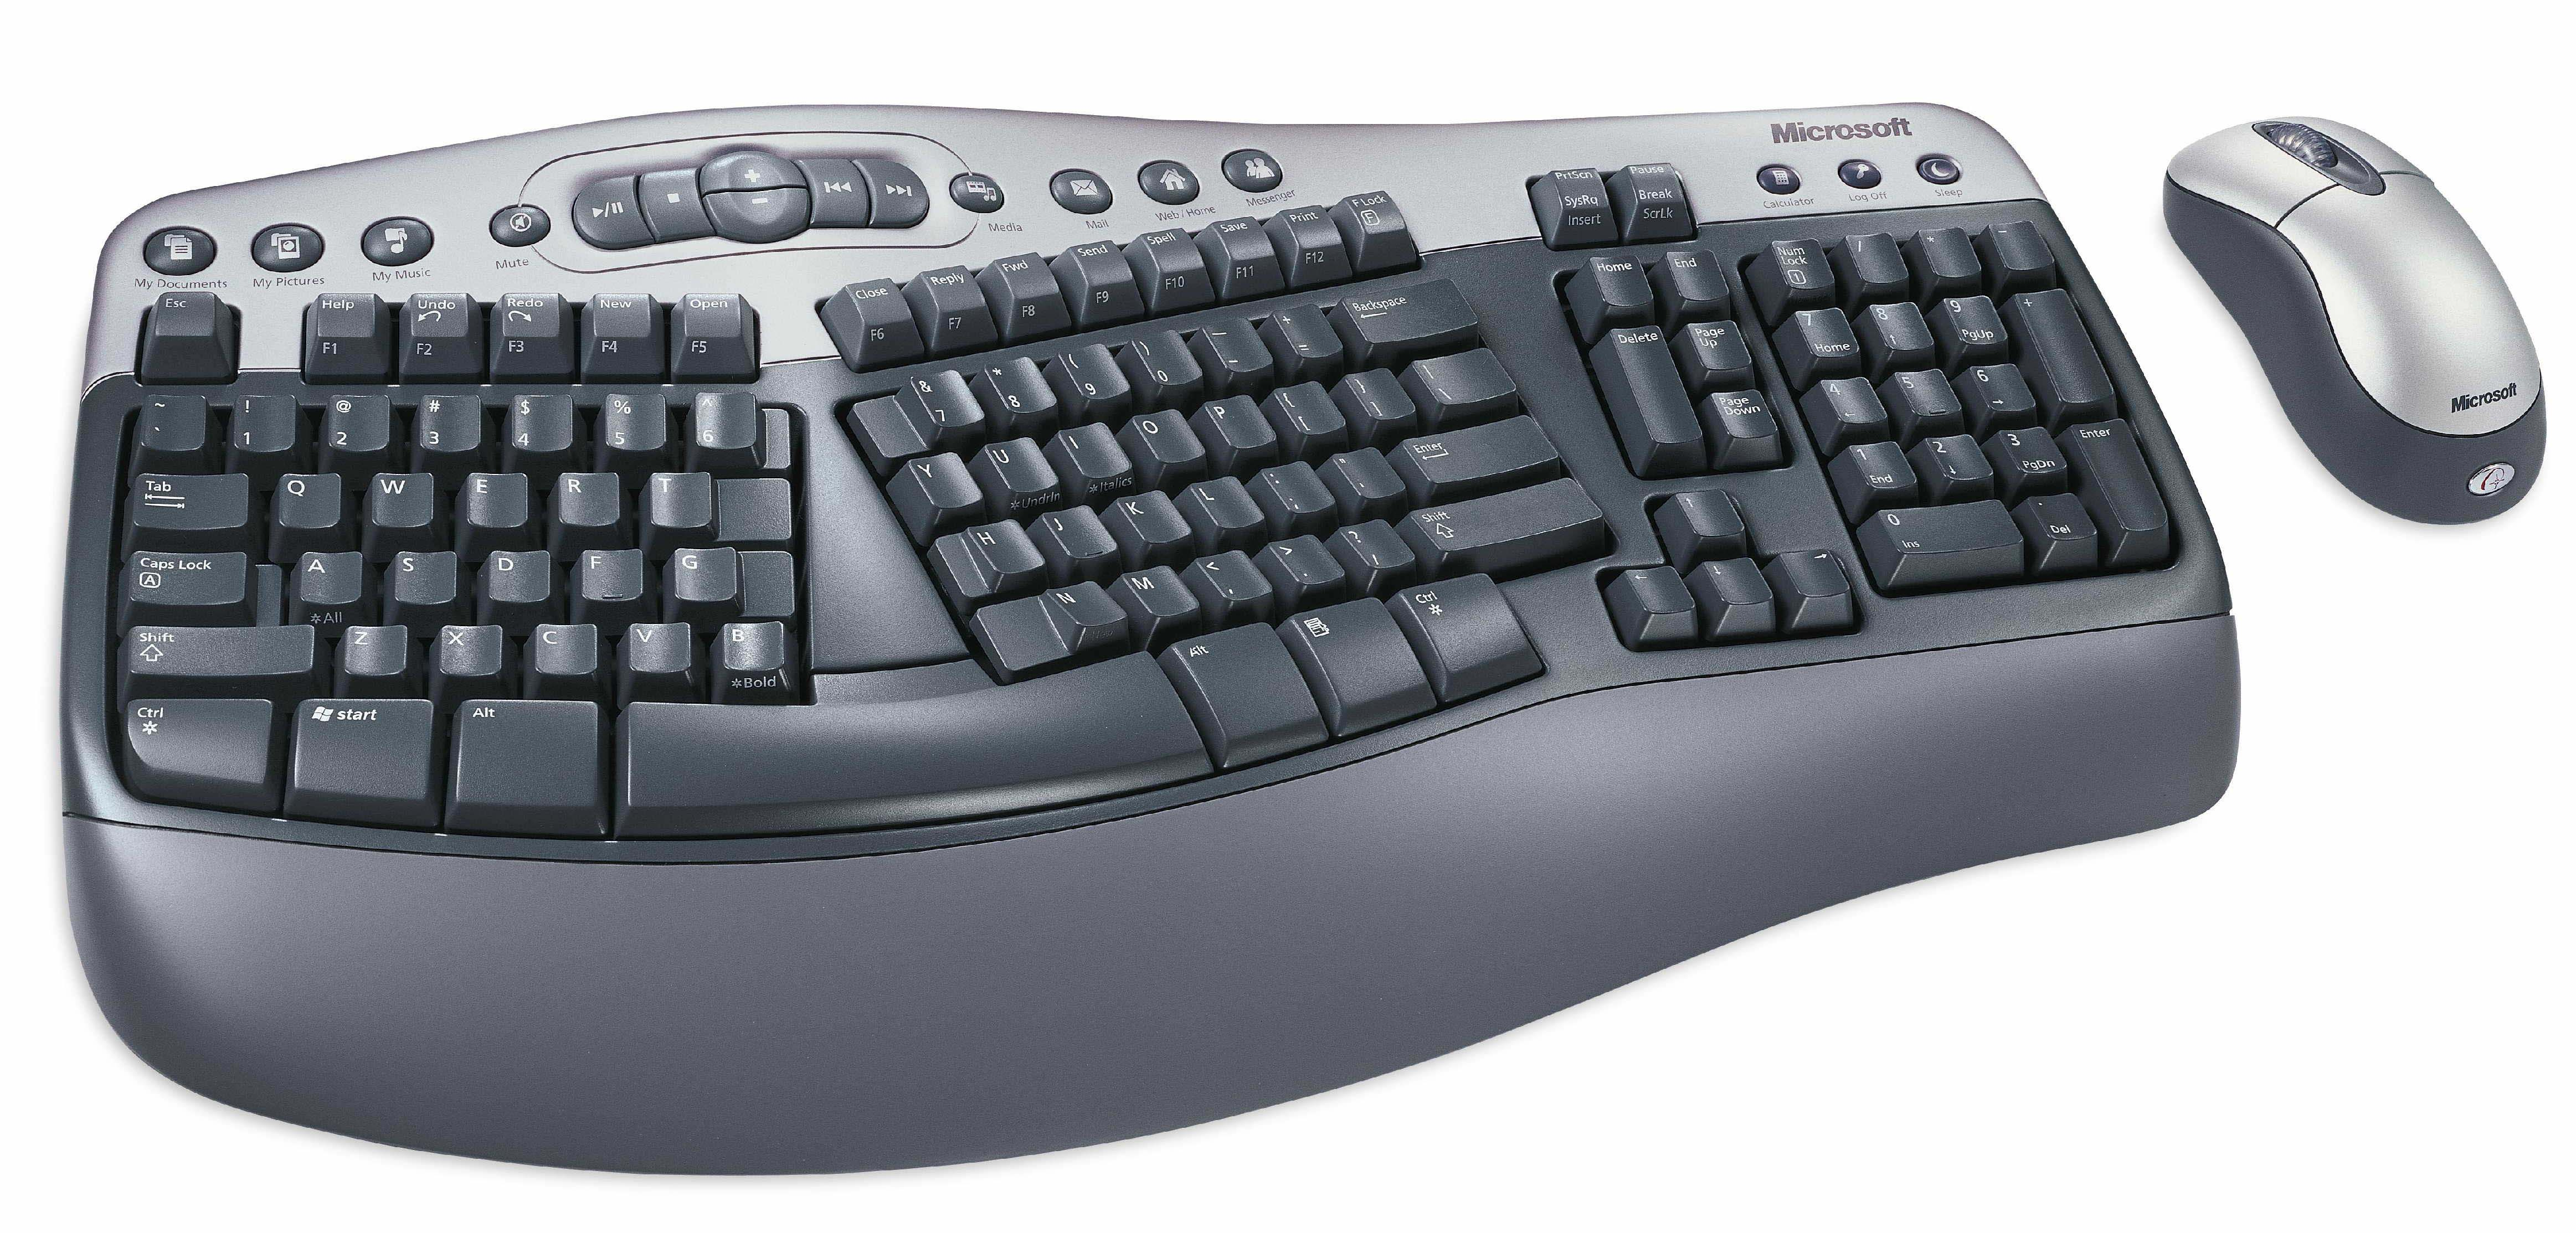 6b7676369de Microsoft Natural Multimedia keyboard 62725 s 4651×2227 ...